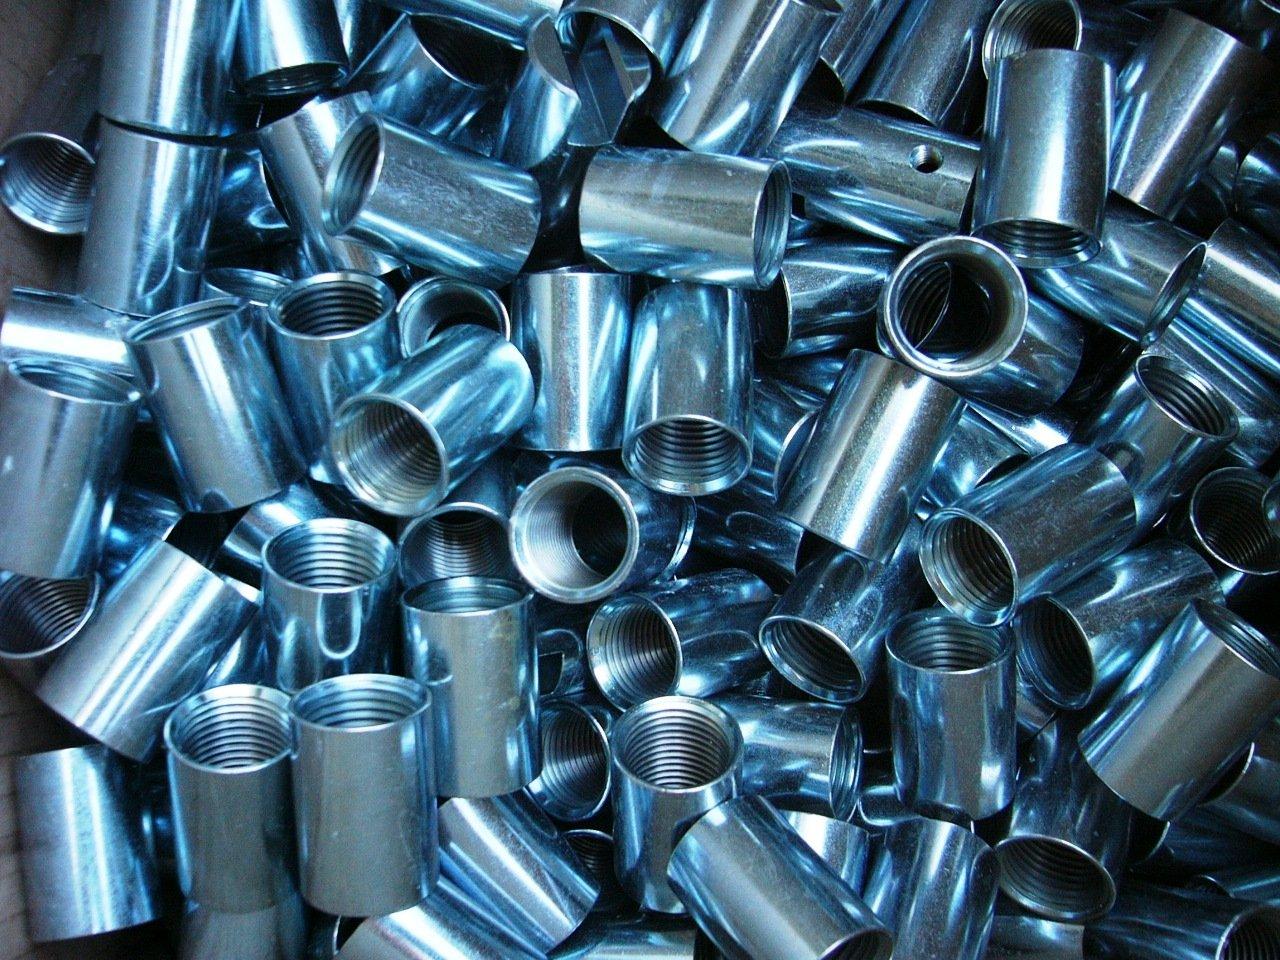 componenti di zincatura bianca a rotobarile